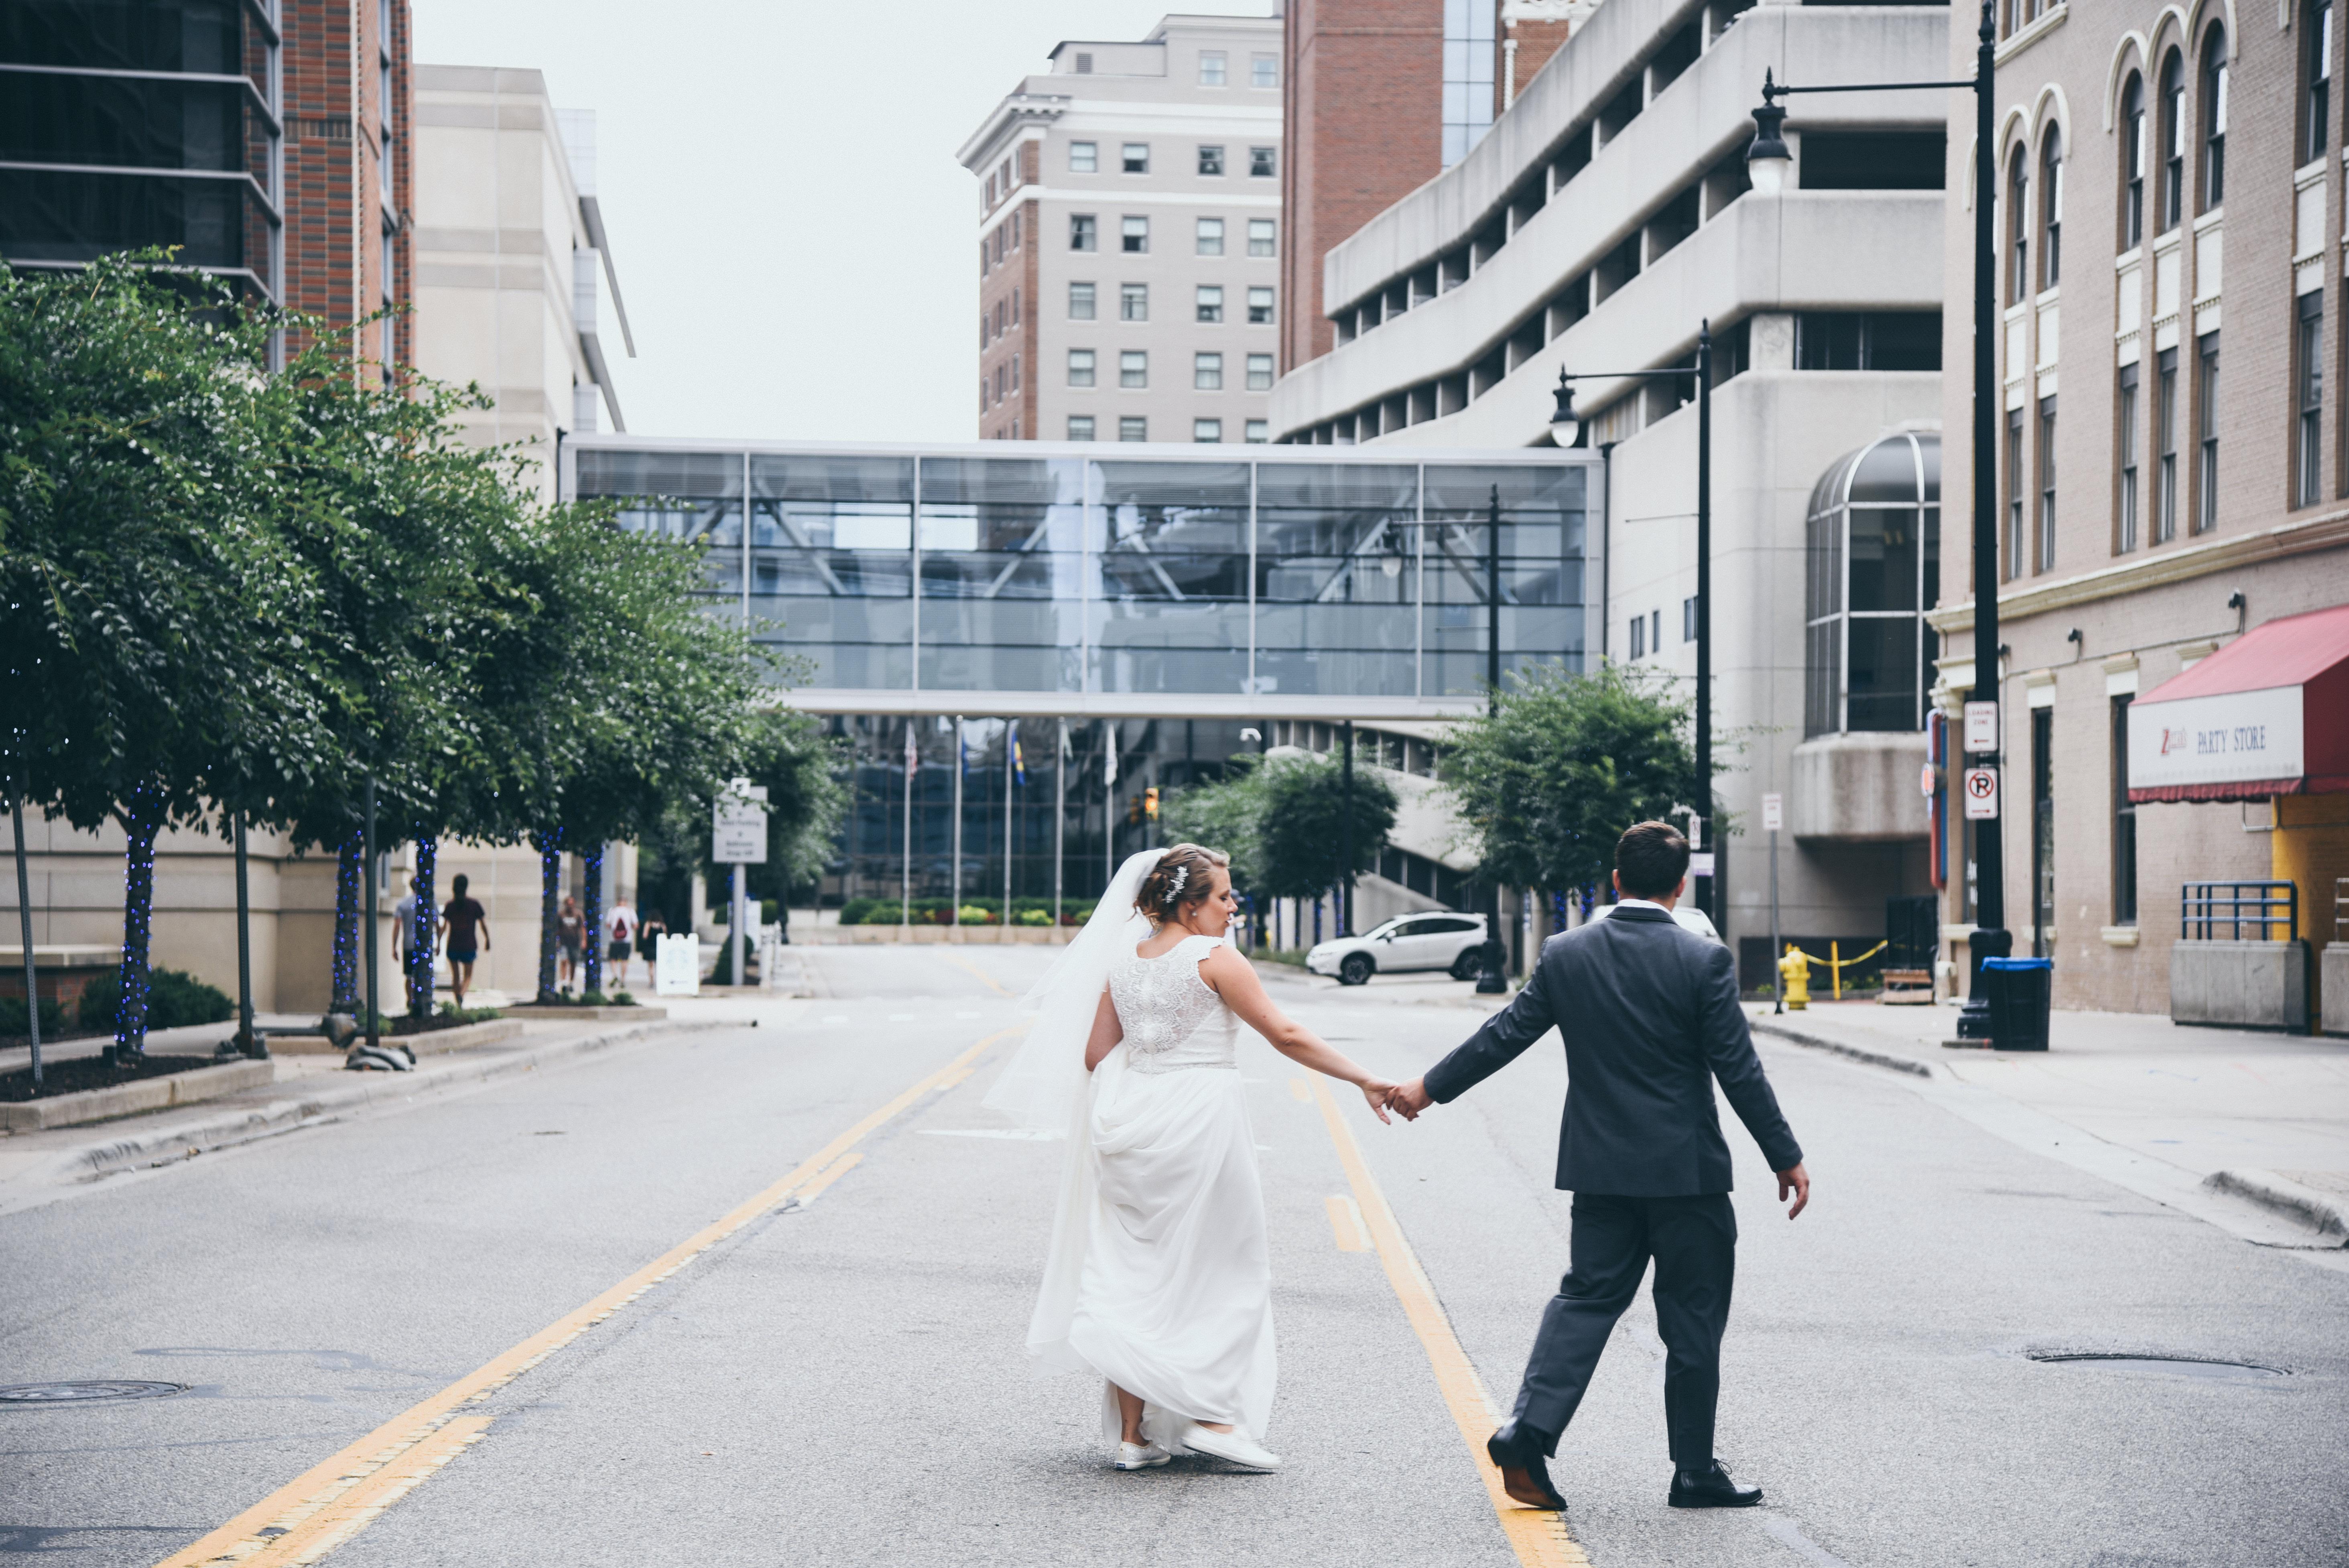 bride and groom walking across a city street